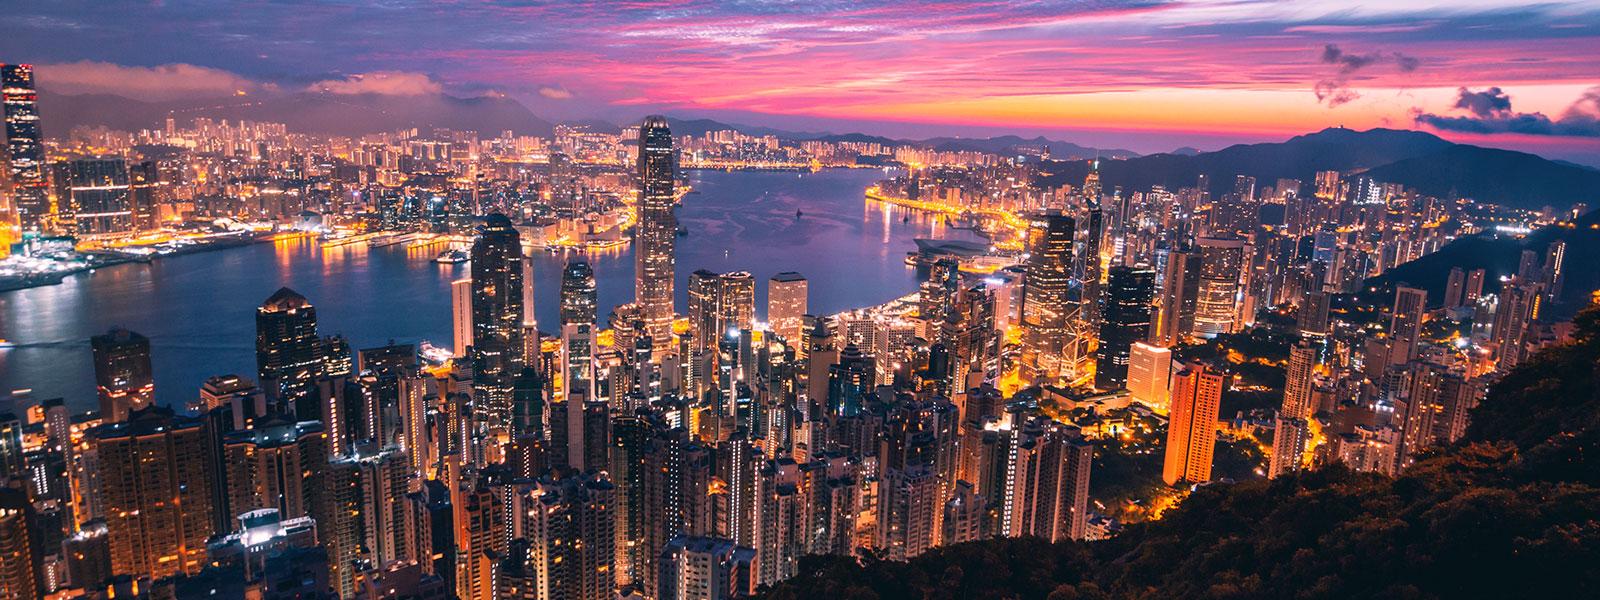 Hong Kong city high-rise buildings lit up at sunset